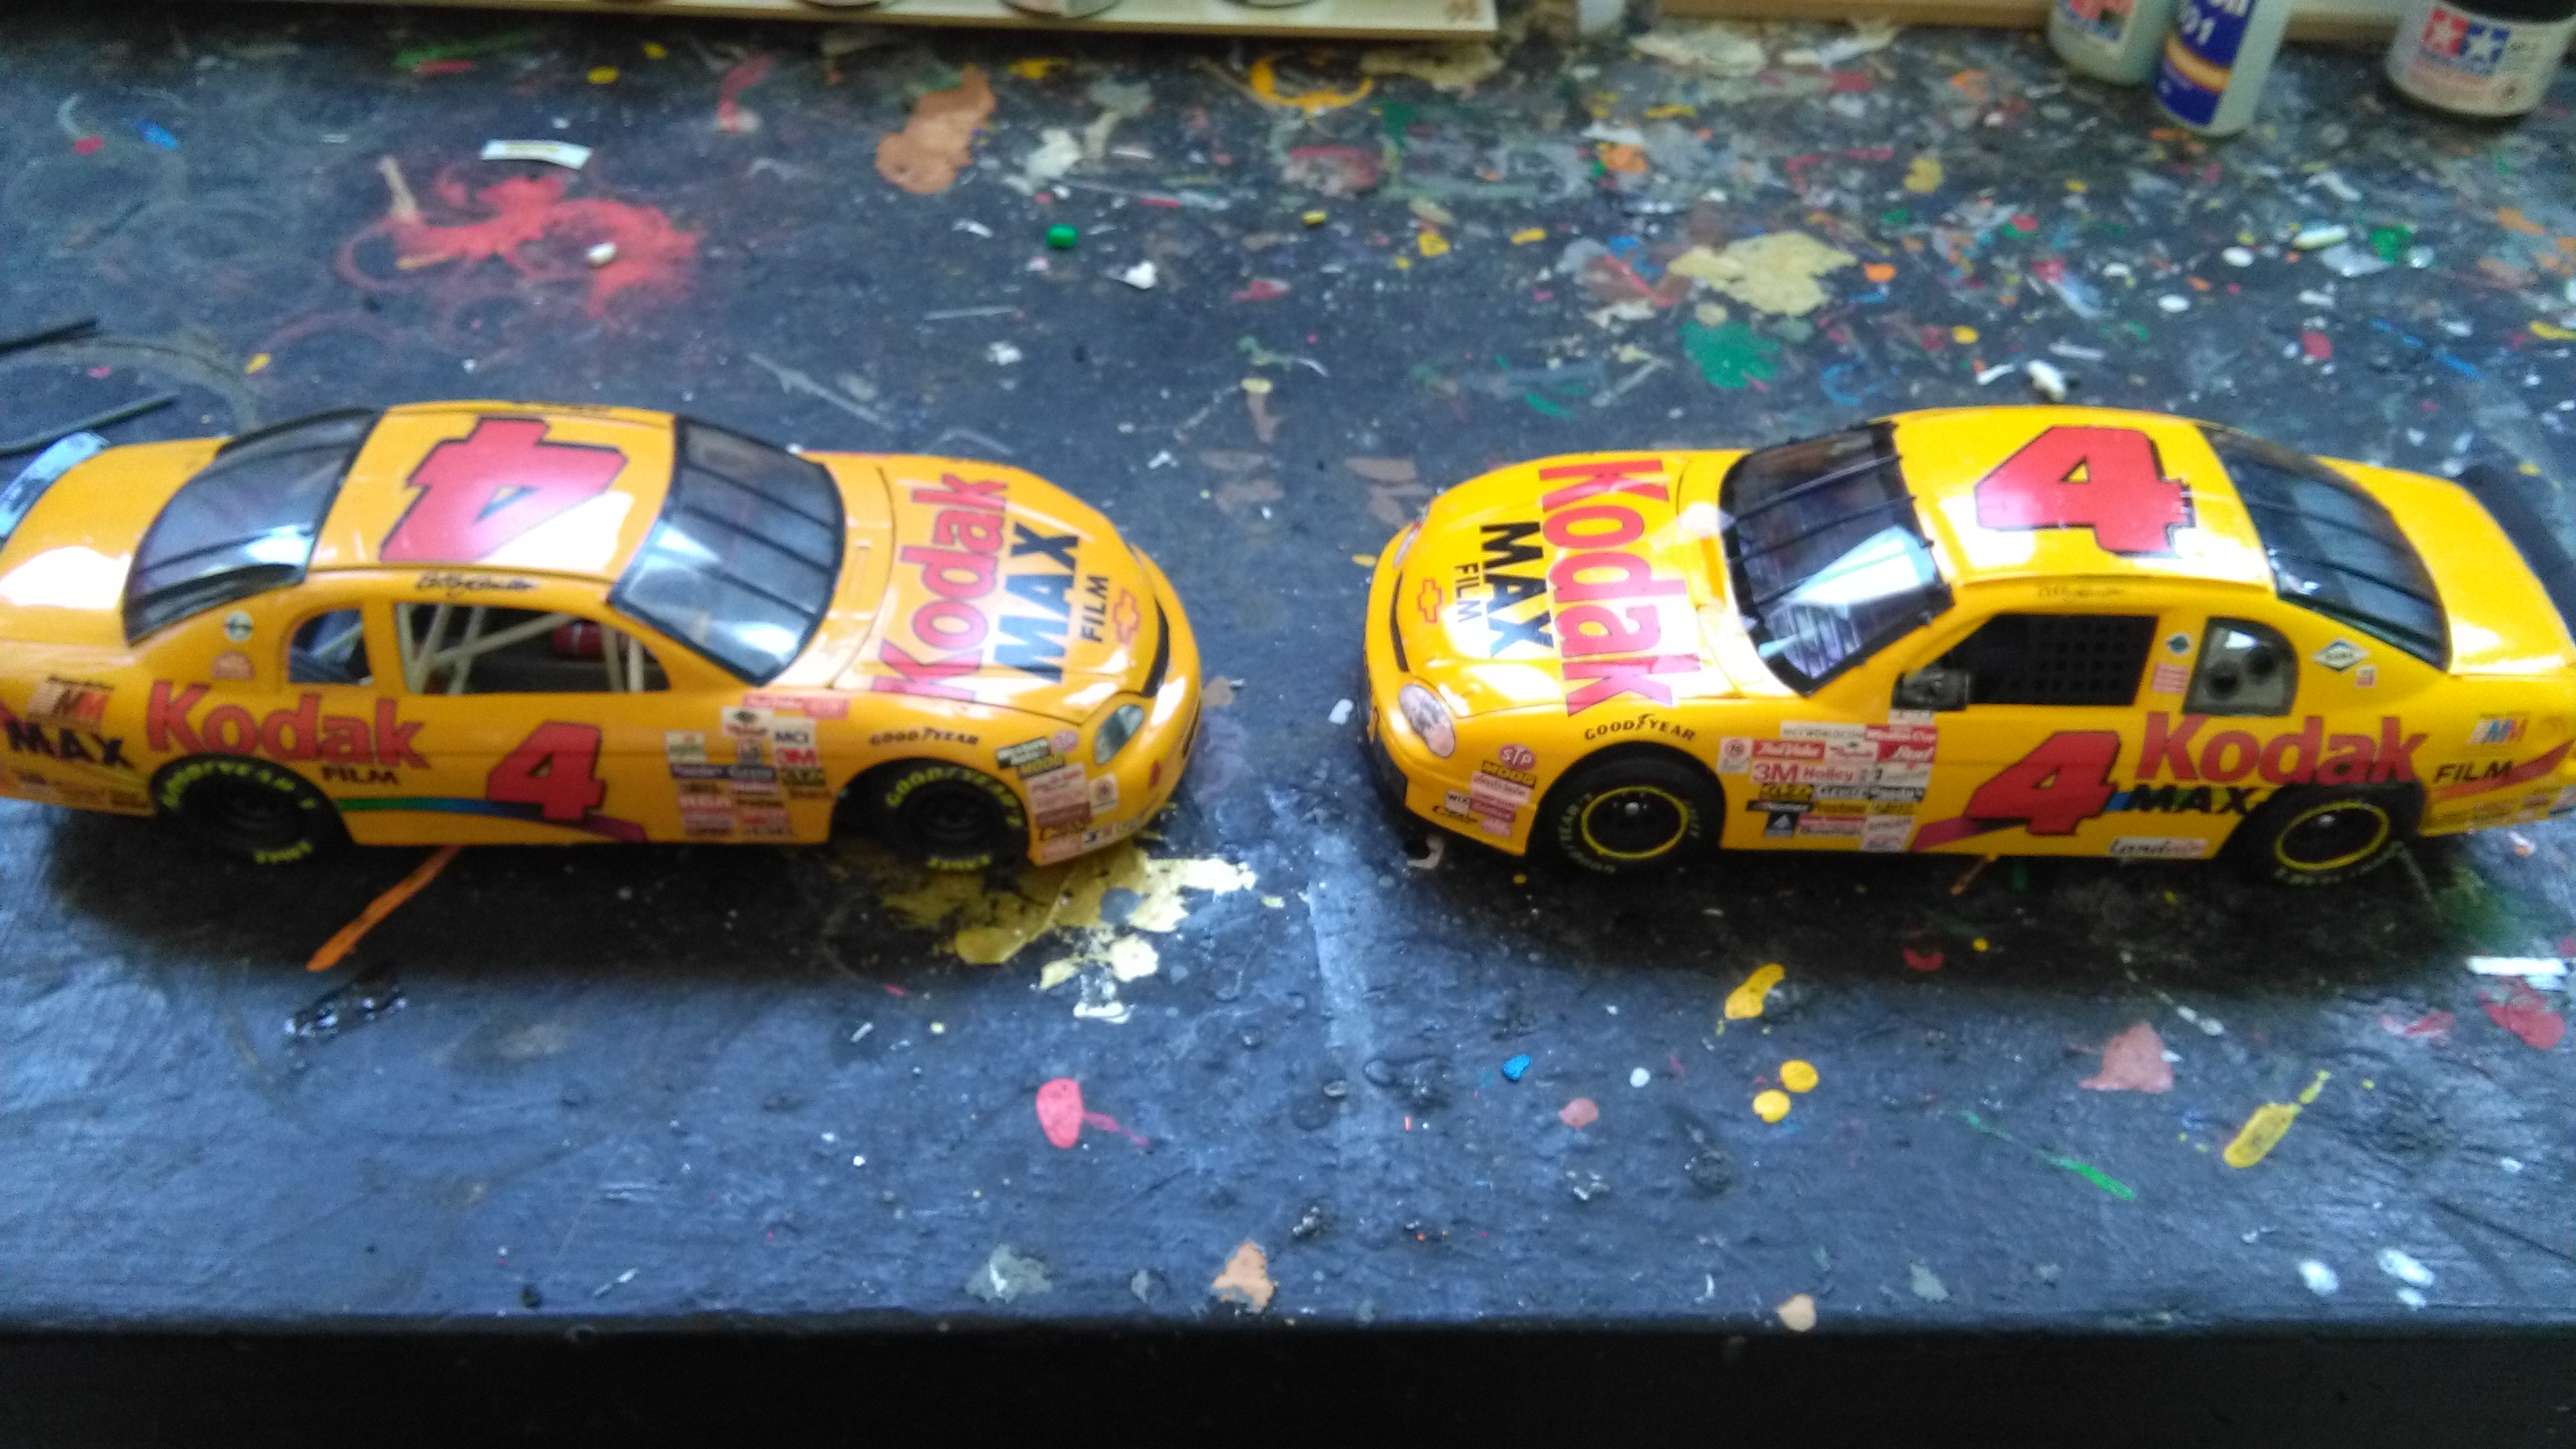 Chevy Monte-Carlo 1998 #4 Bobby Hamilton Kodak  180926IMG20170311143019